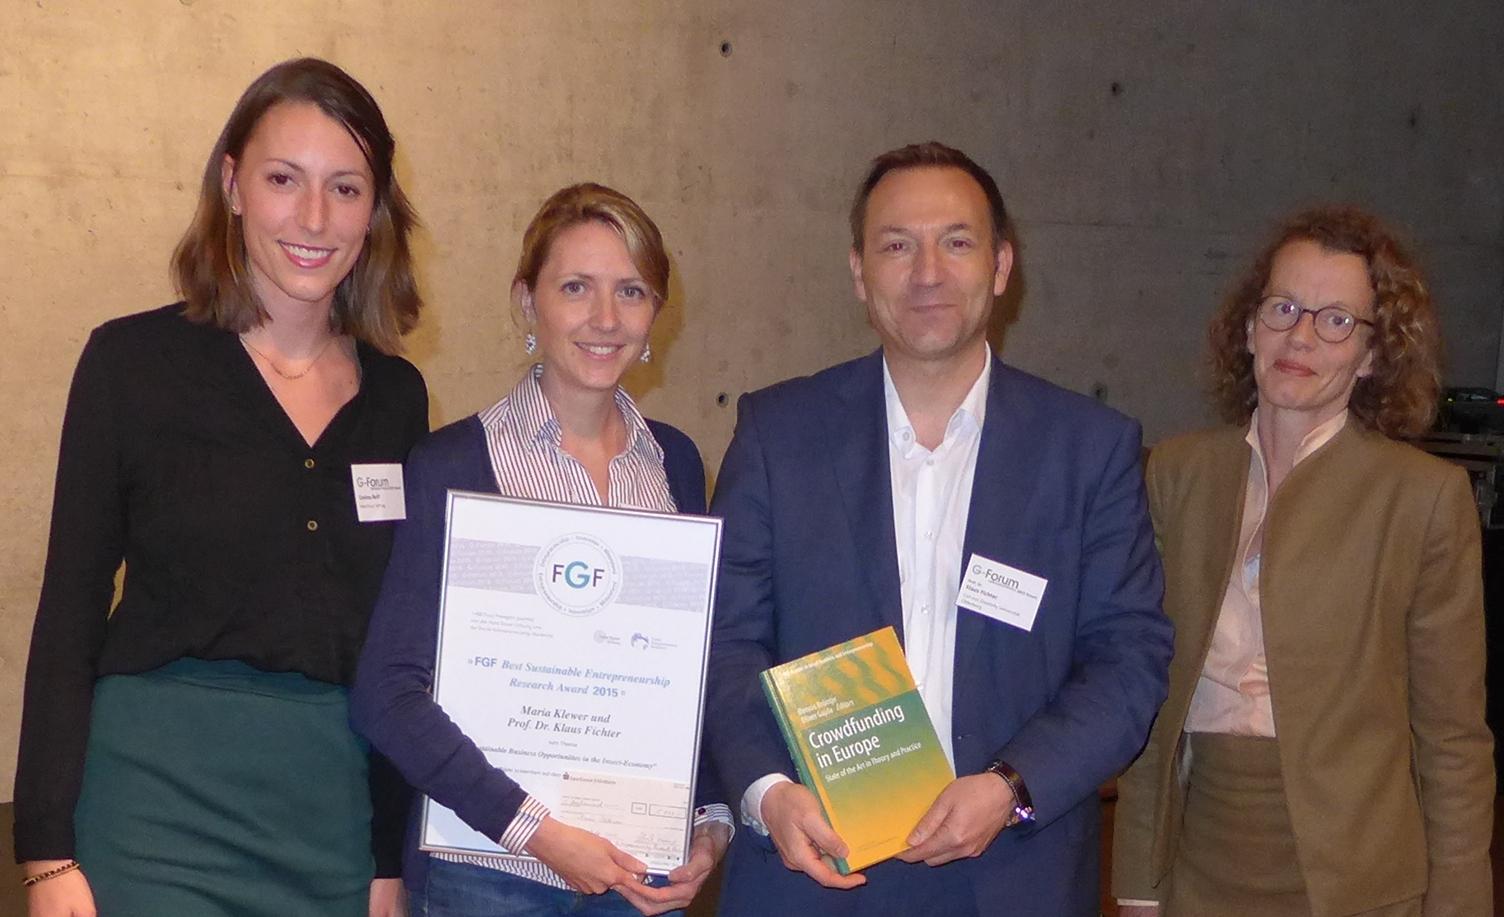 sustainable-award-2015-preisuebergabe-1-2